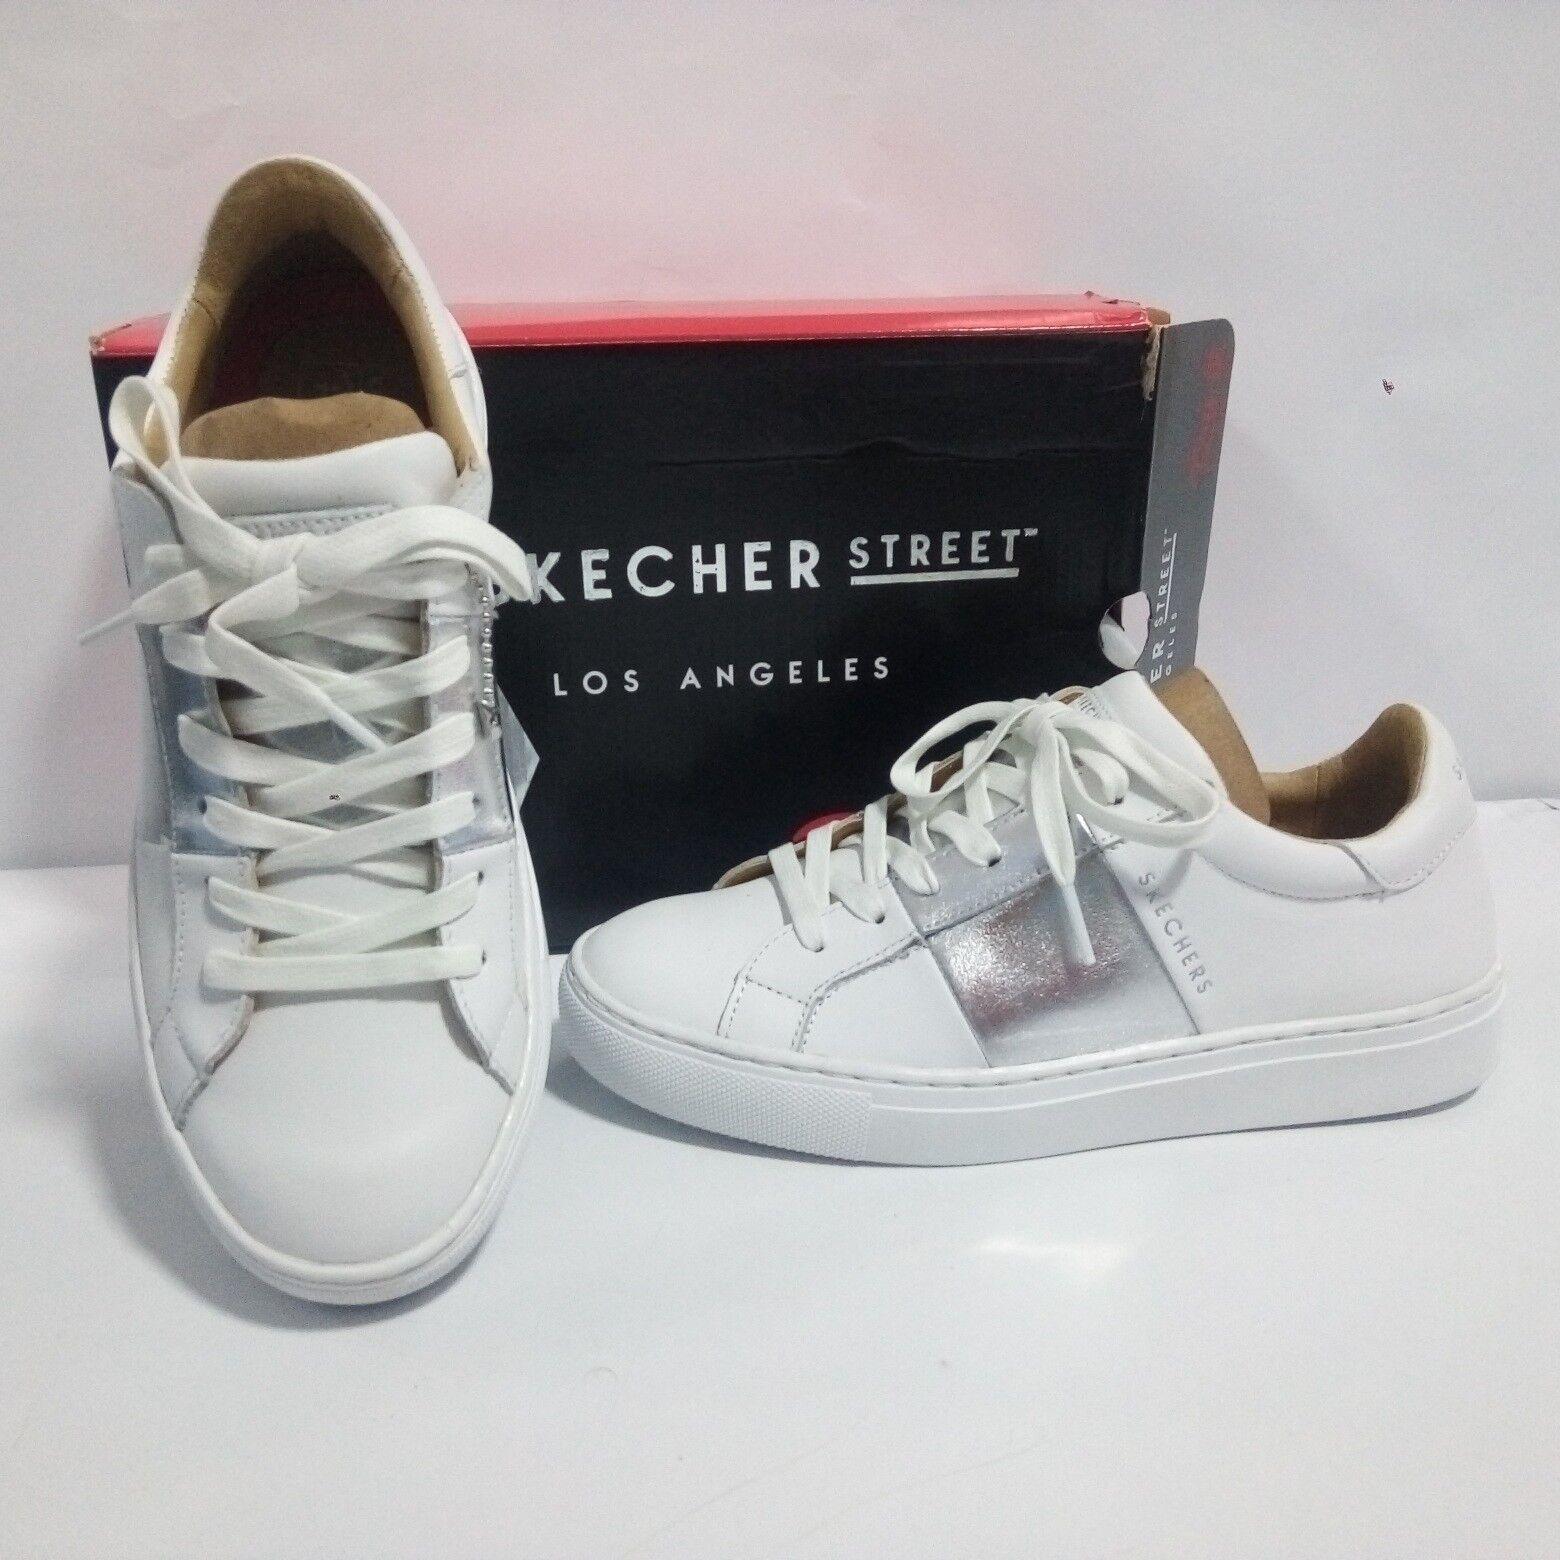 Scarpe Skechers Donna - Side Street 73550 Banded - Bianco - 73550 Street b5f222